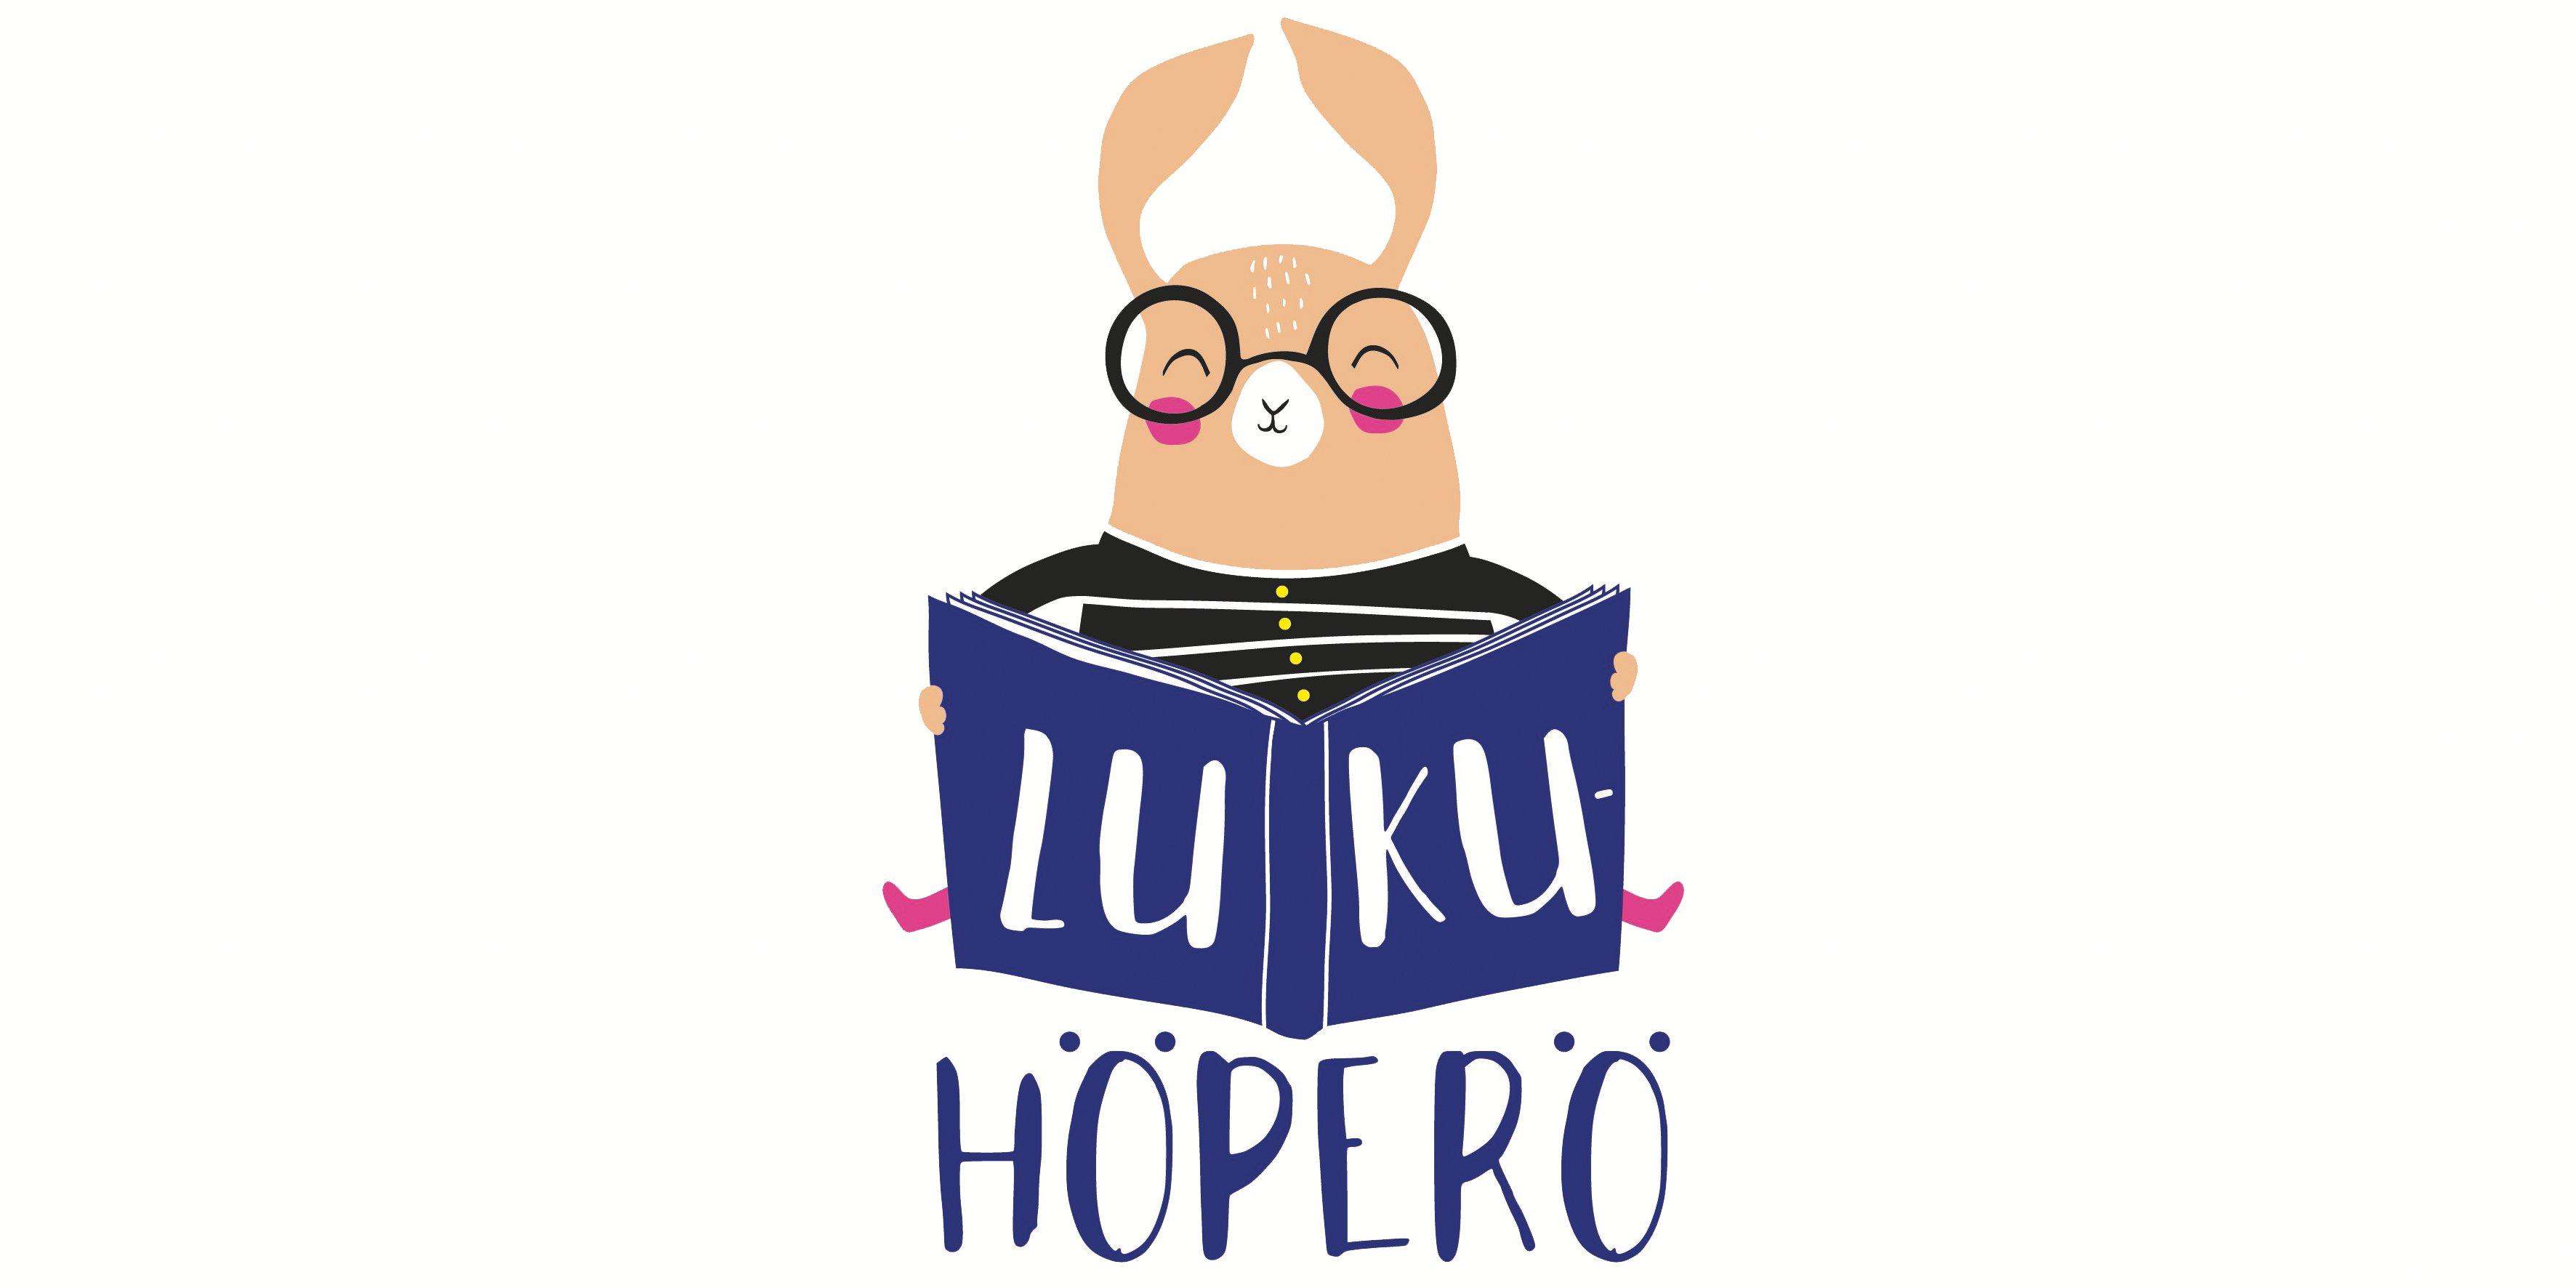 Lukuhöperö-logo